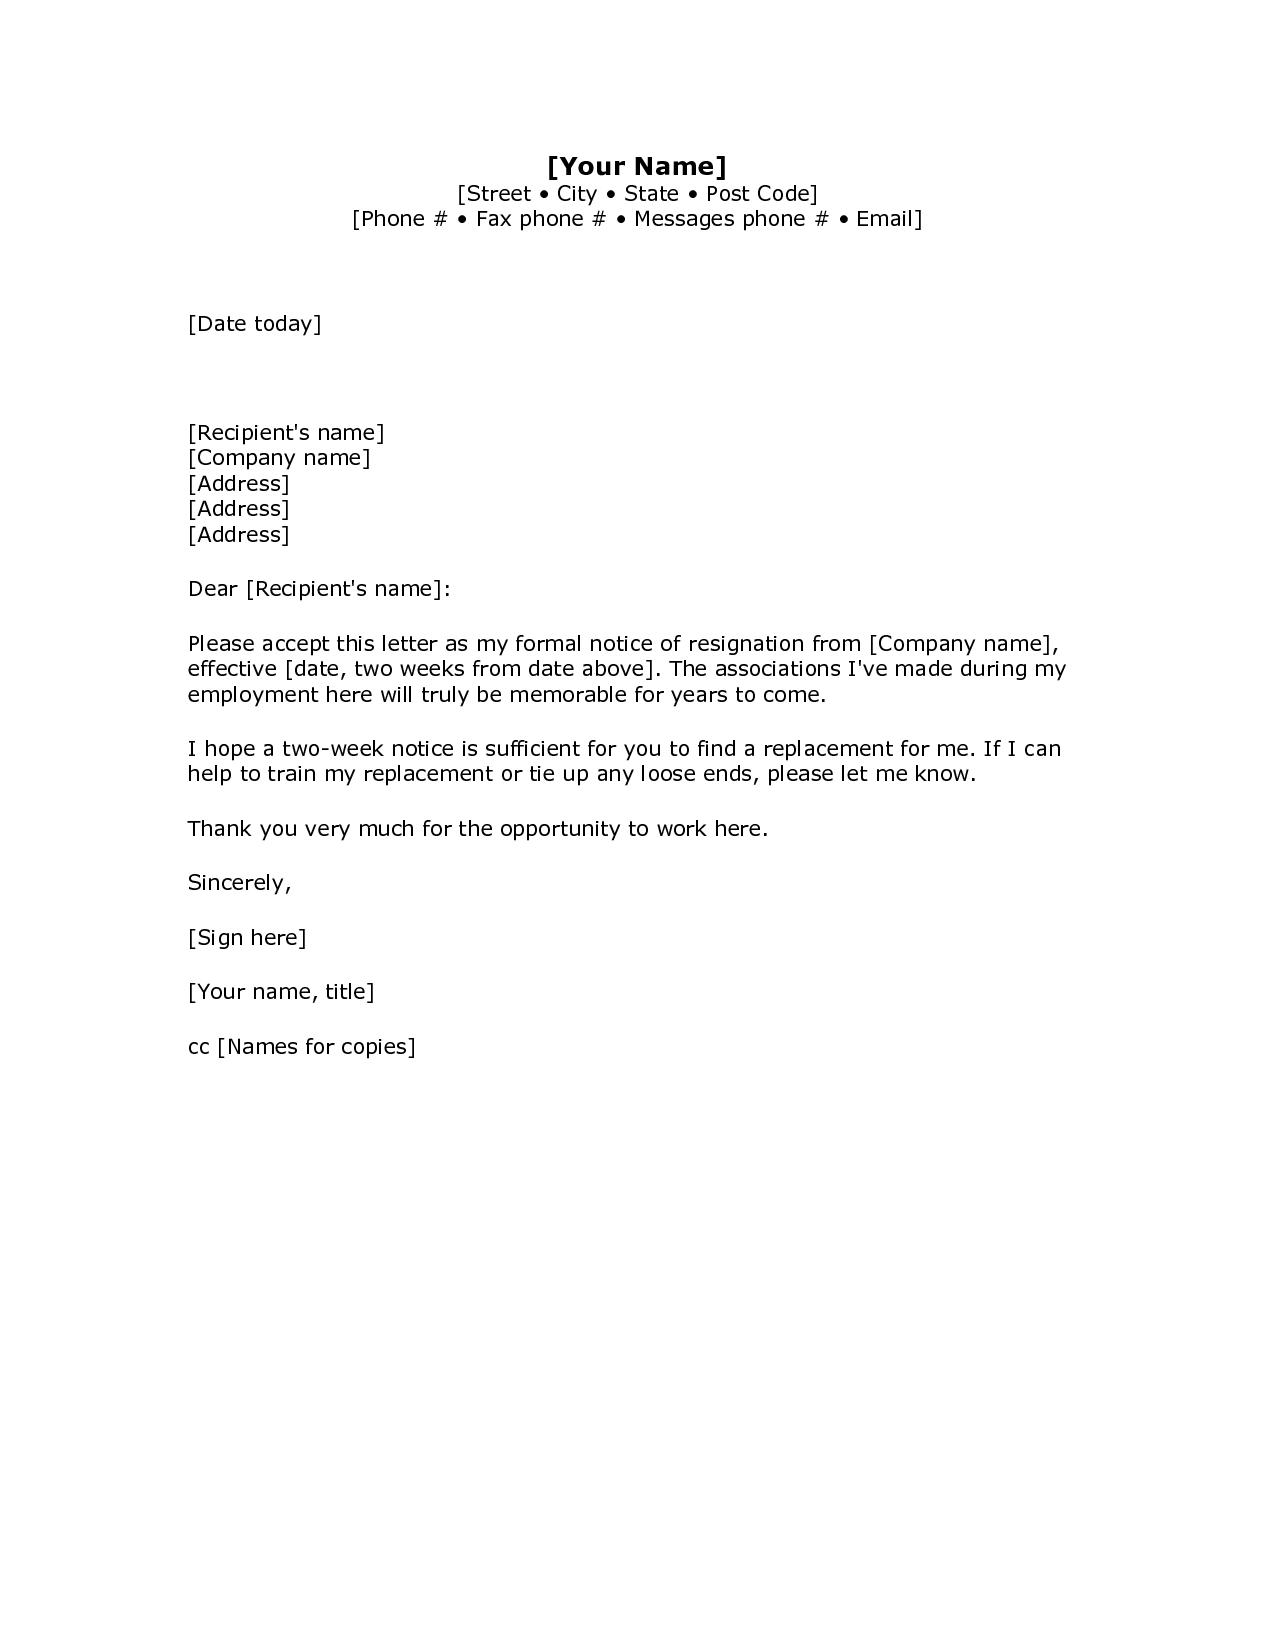 Board Member Resignation Letter Template - 2 Weeks Notice Letter Resignation Letter Week Notice Words Hdwriting